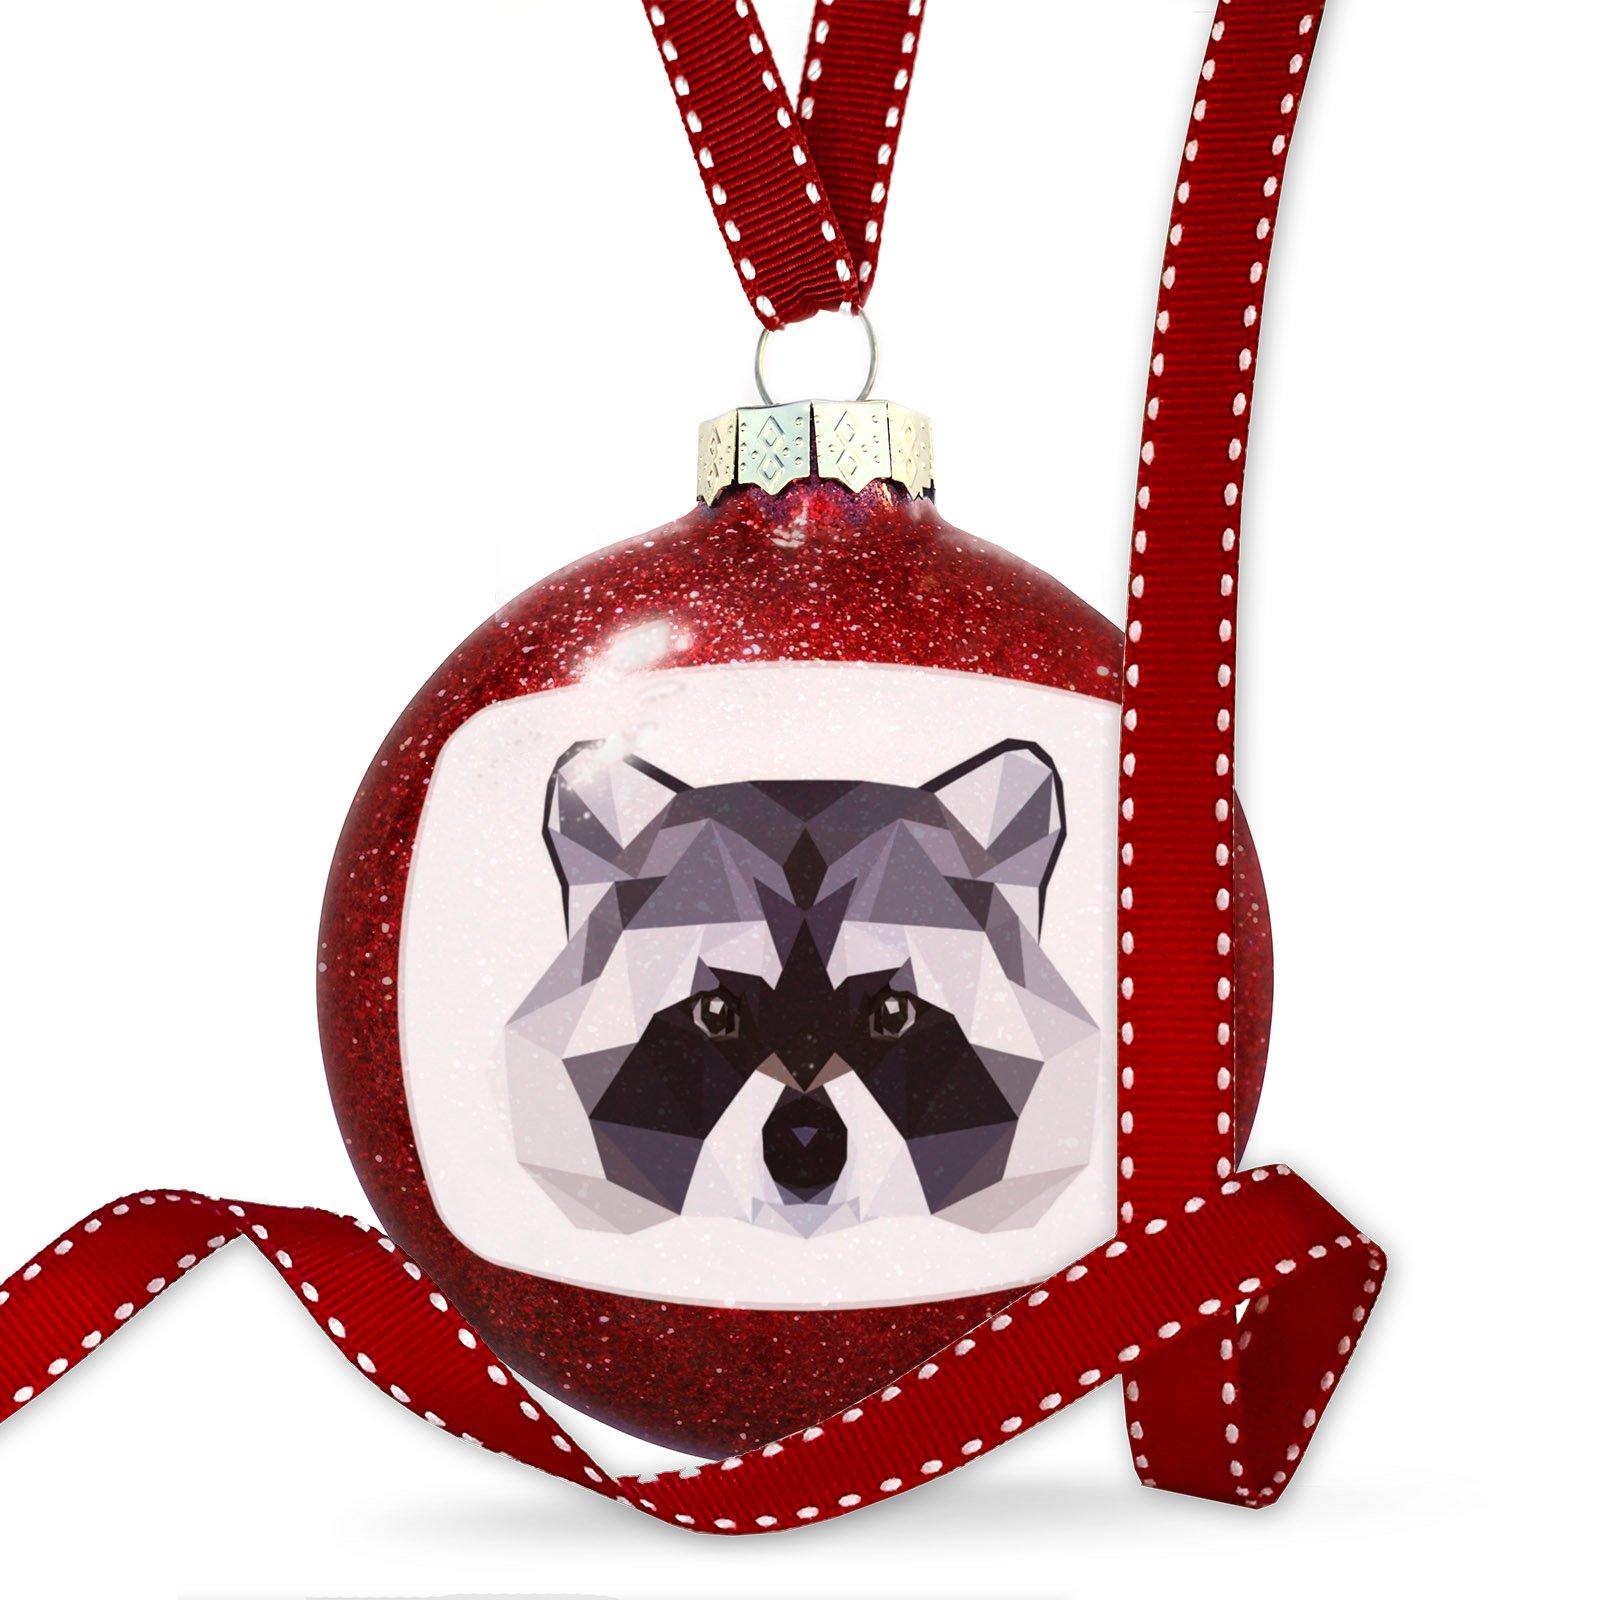 Christmas Decoration Geometric Animal art Raccoon Ornament by NEONBLOND